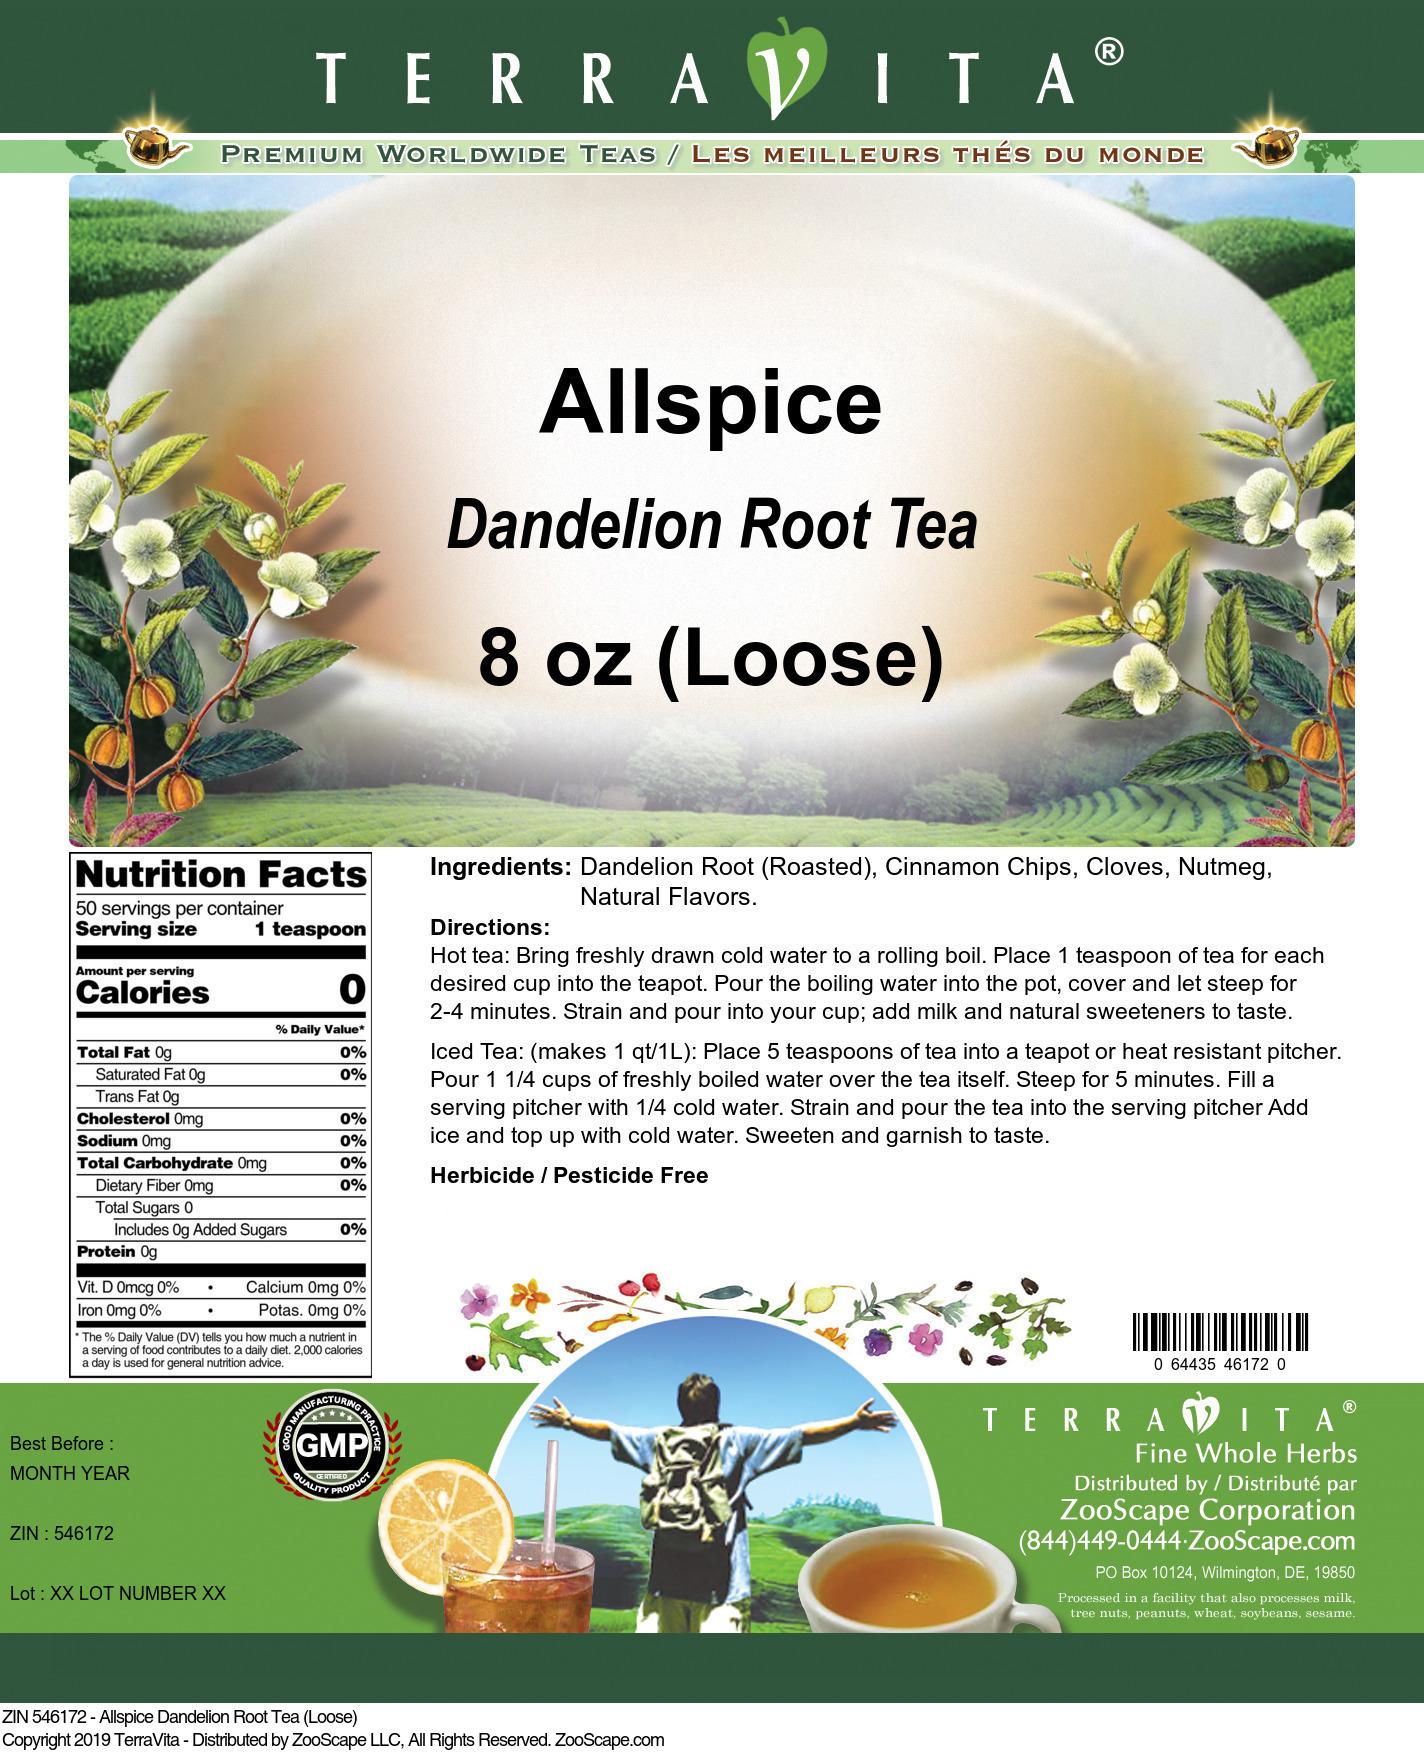 Allspice Dandelion Root Tea (Loose)